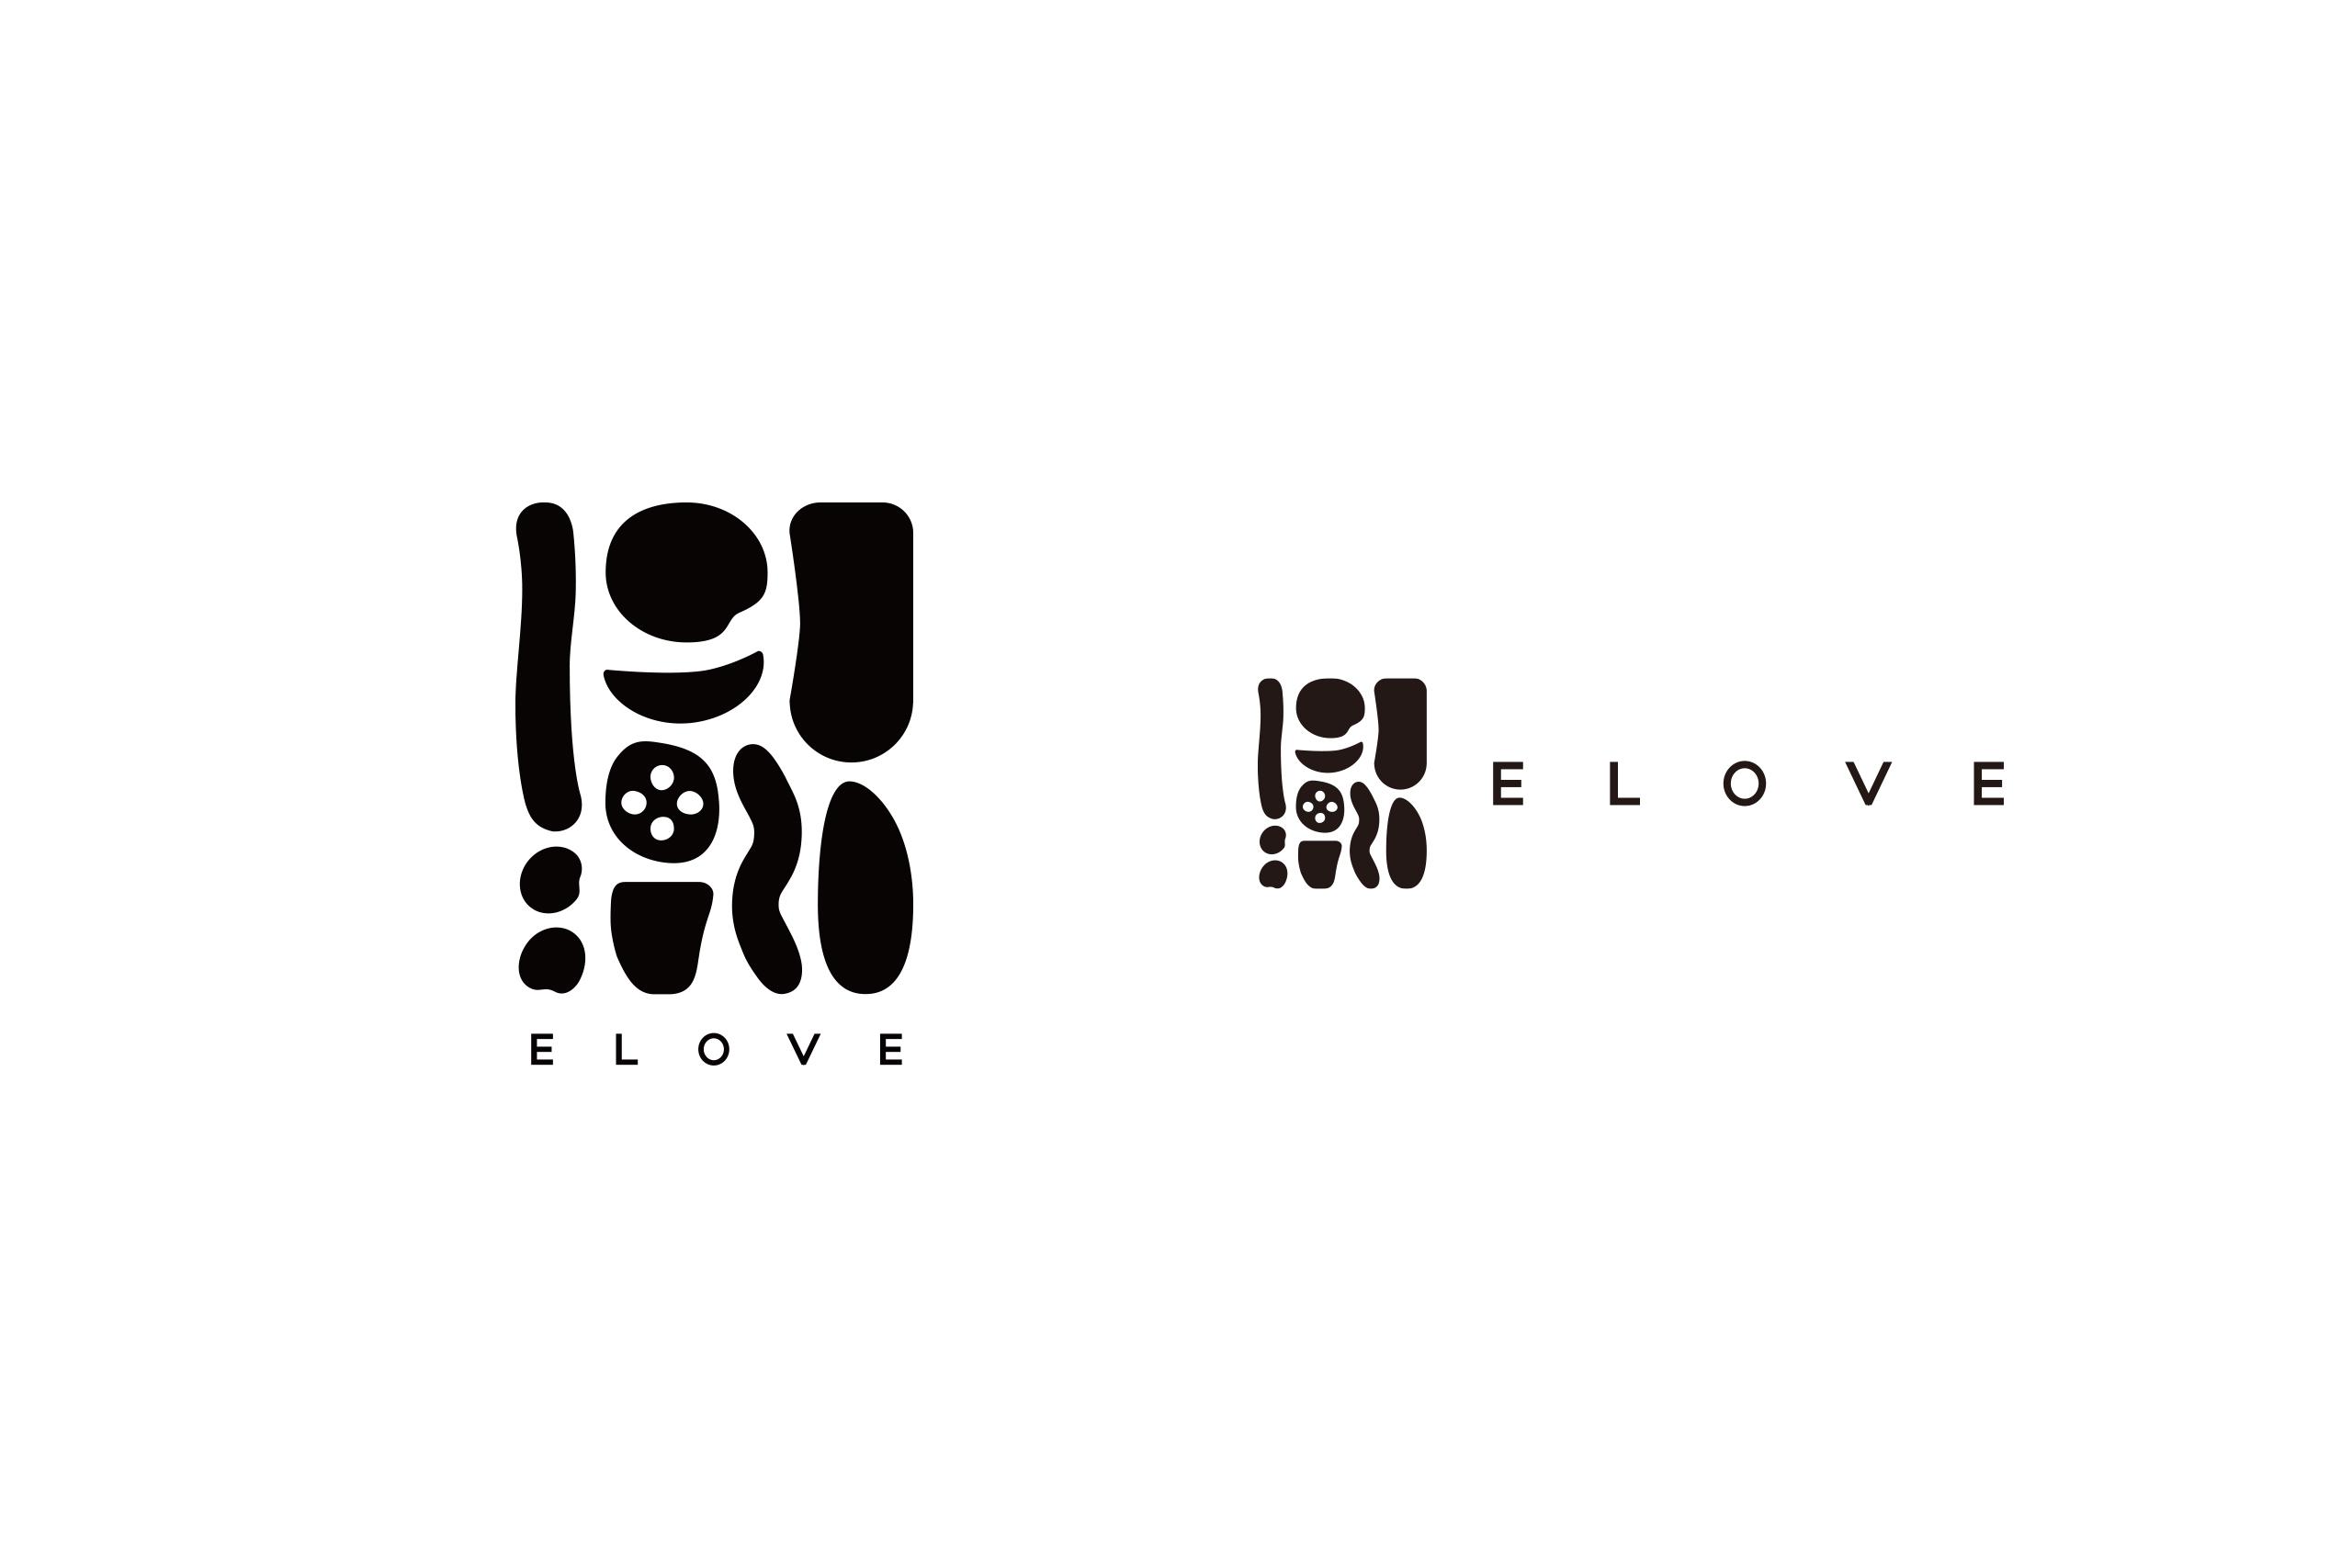 elove_logo002